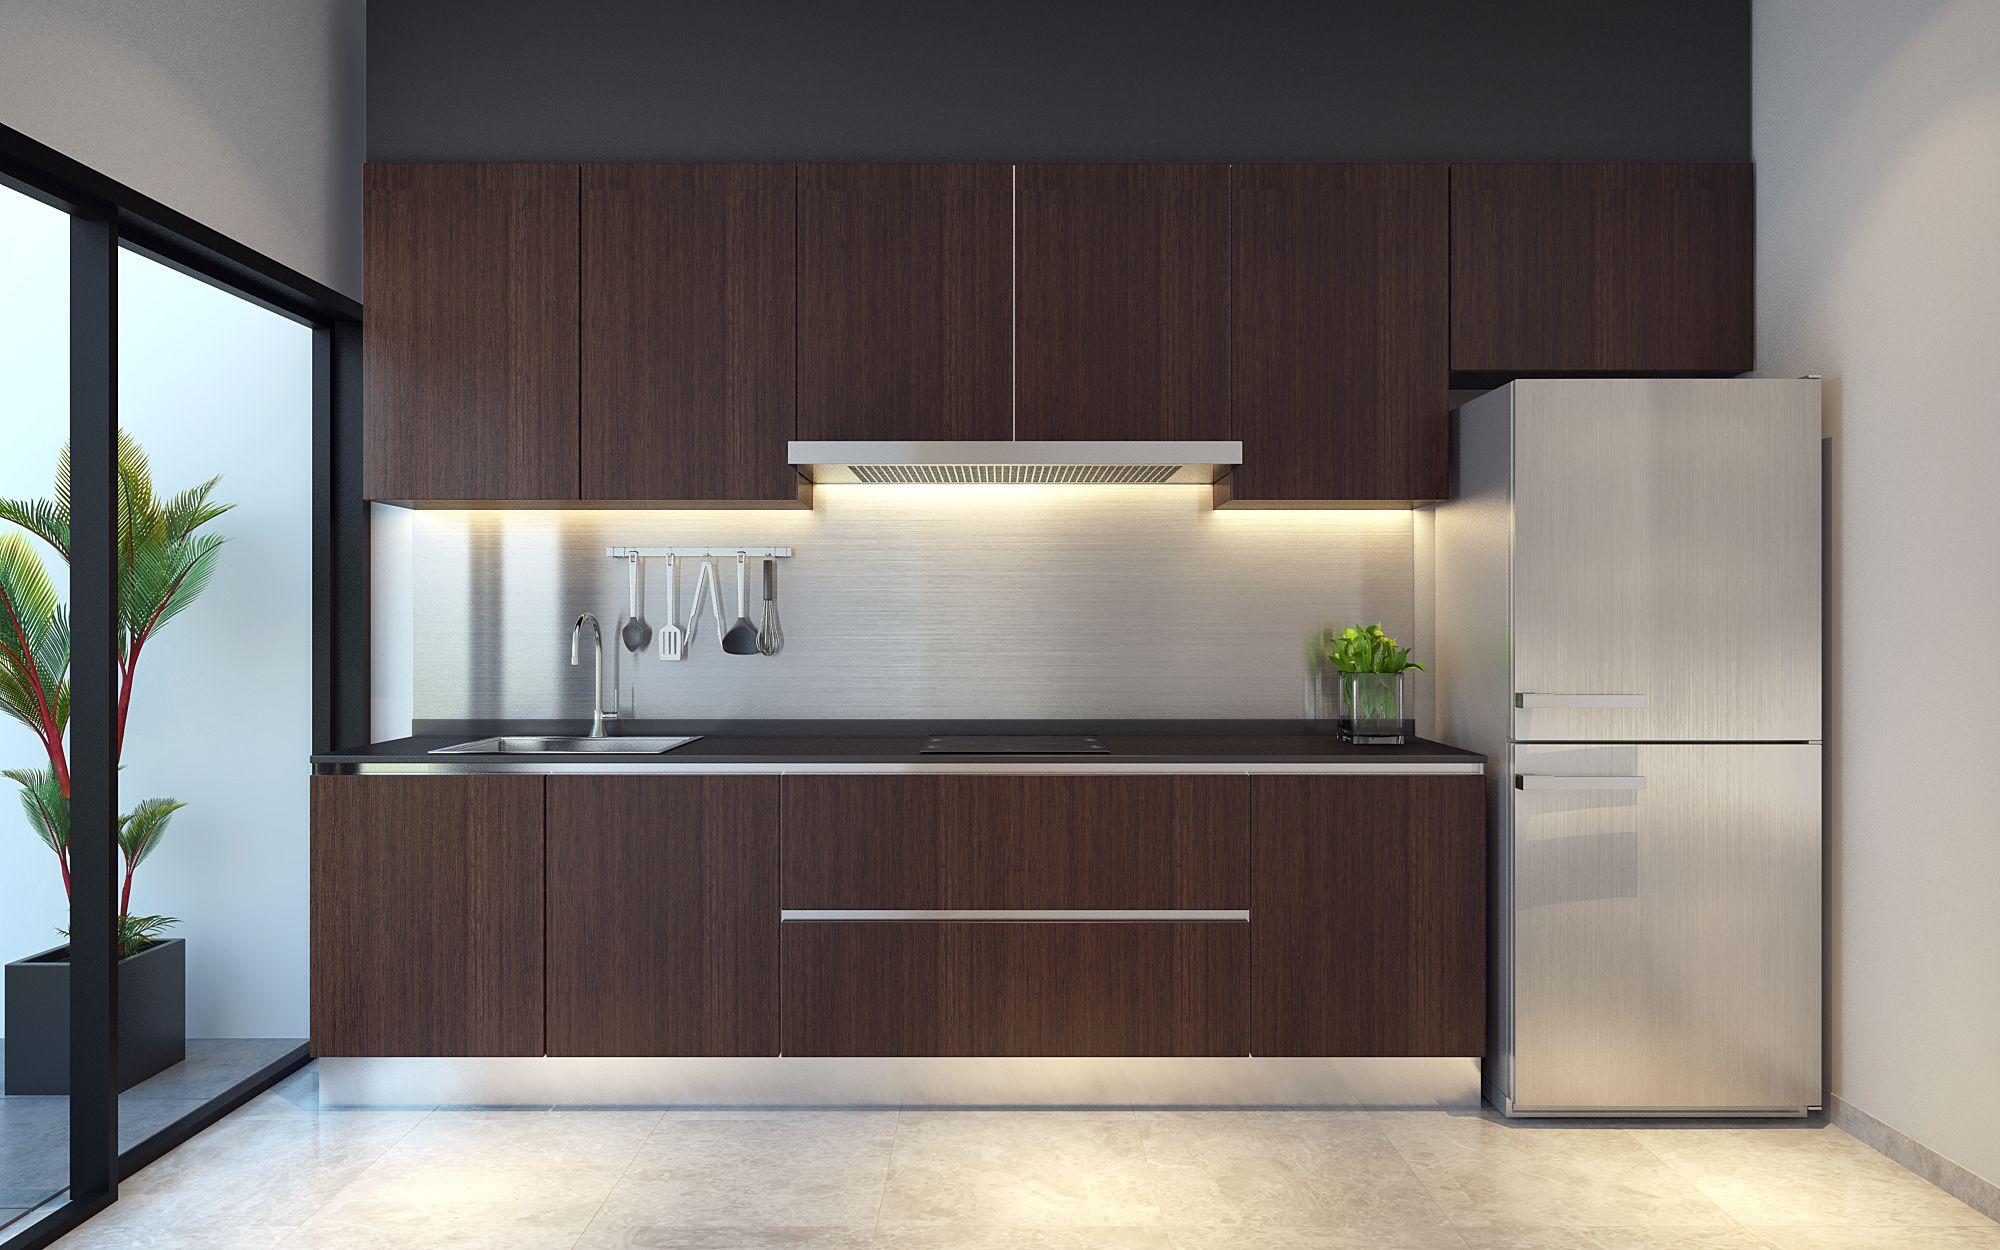 Wet Kitchen For Semi Detached House Near Thomson Singapore Extraordinary Wet Kitchen Design Inspiration Design